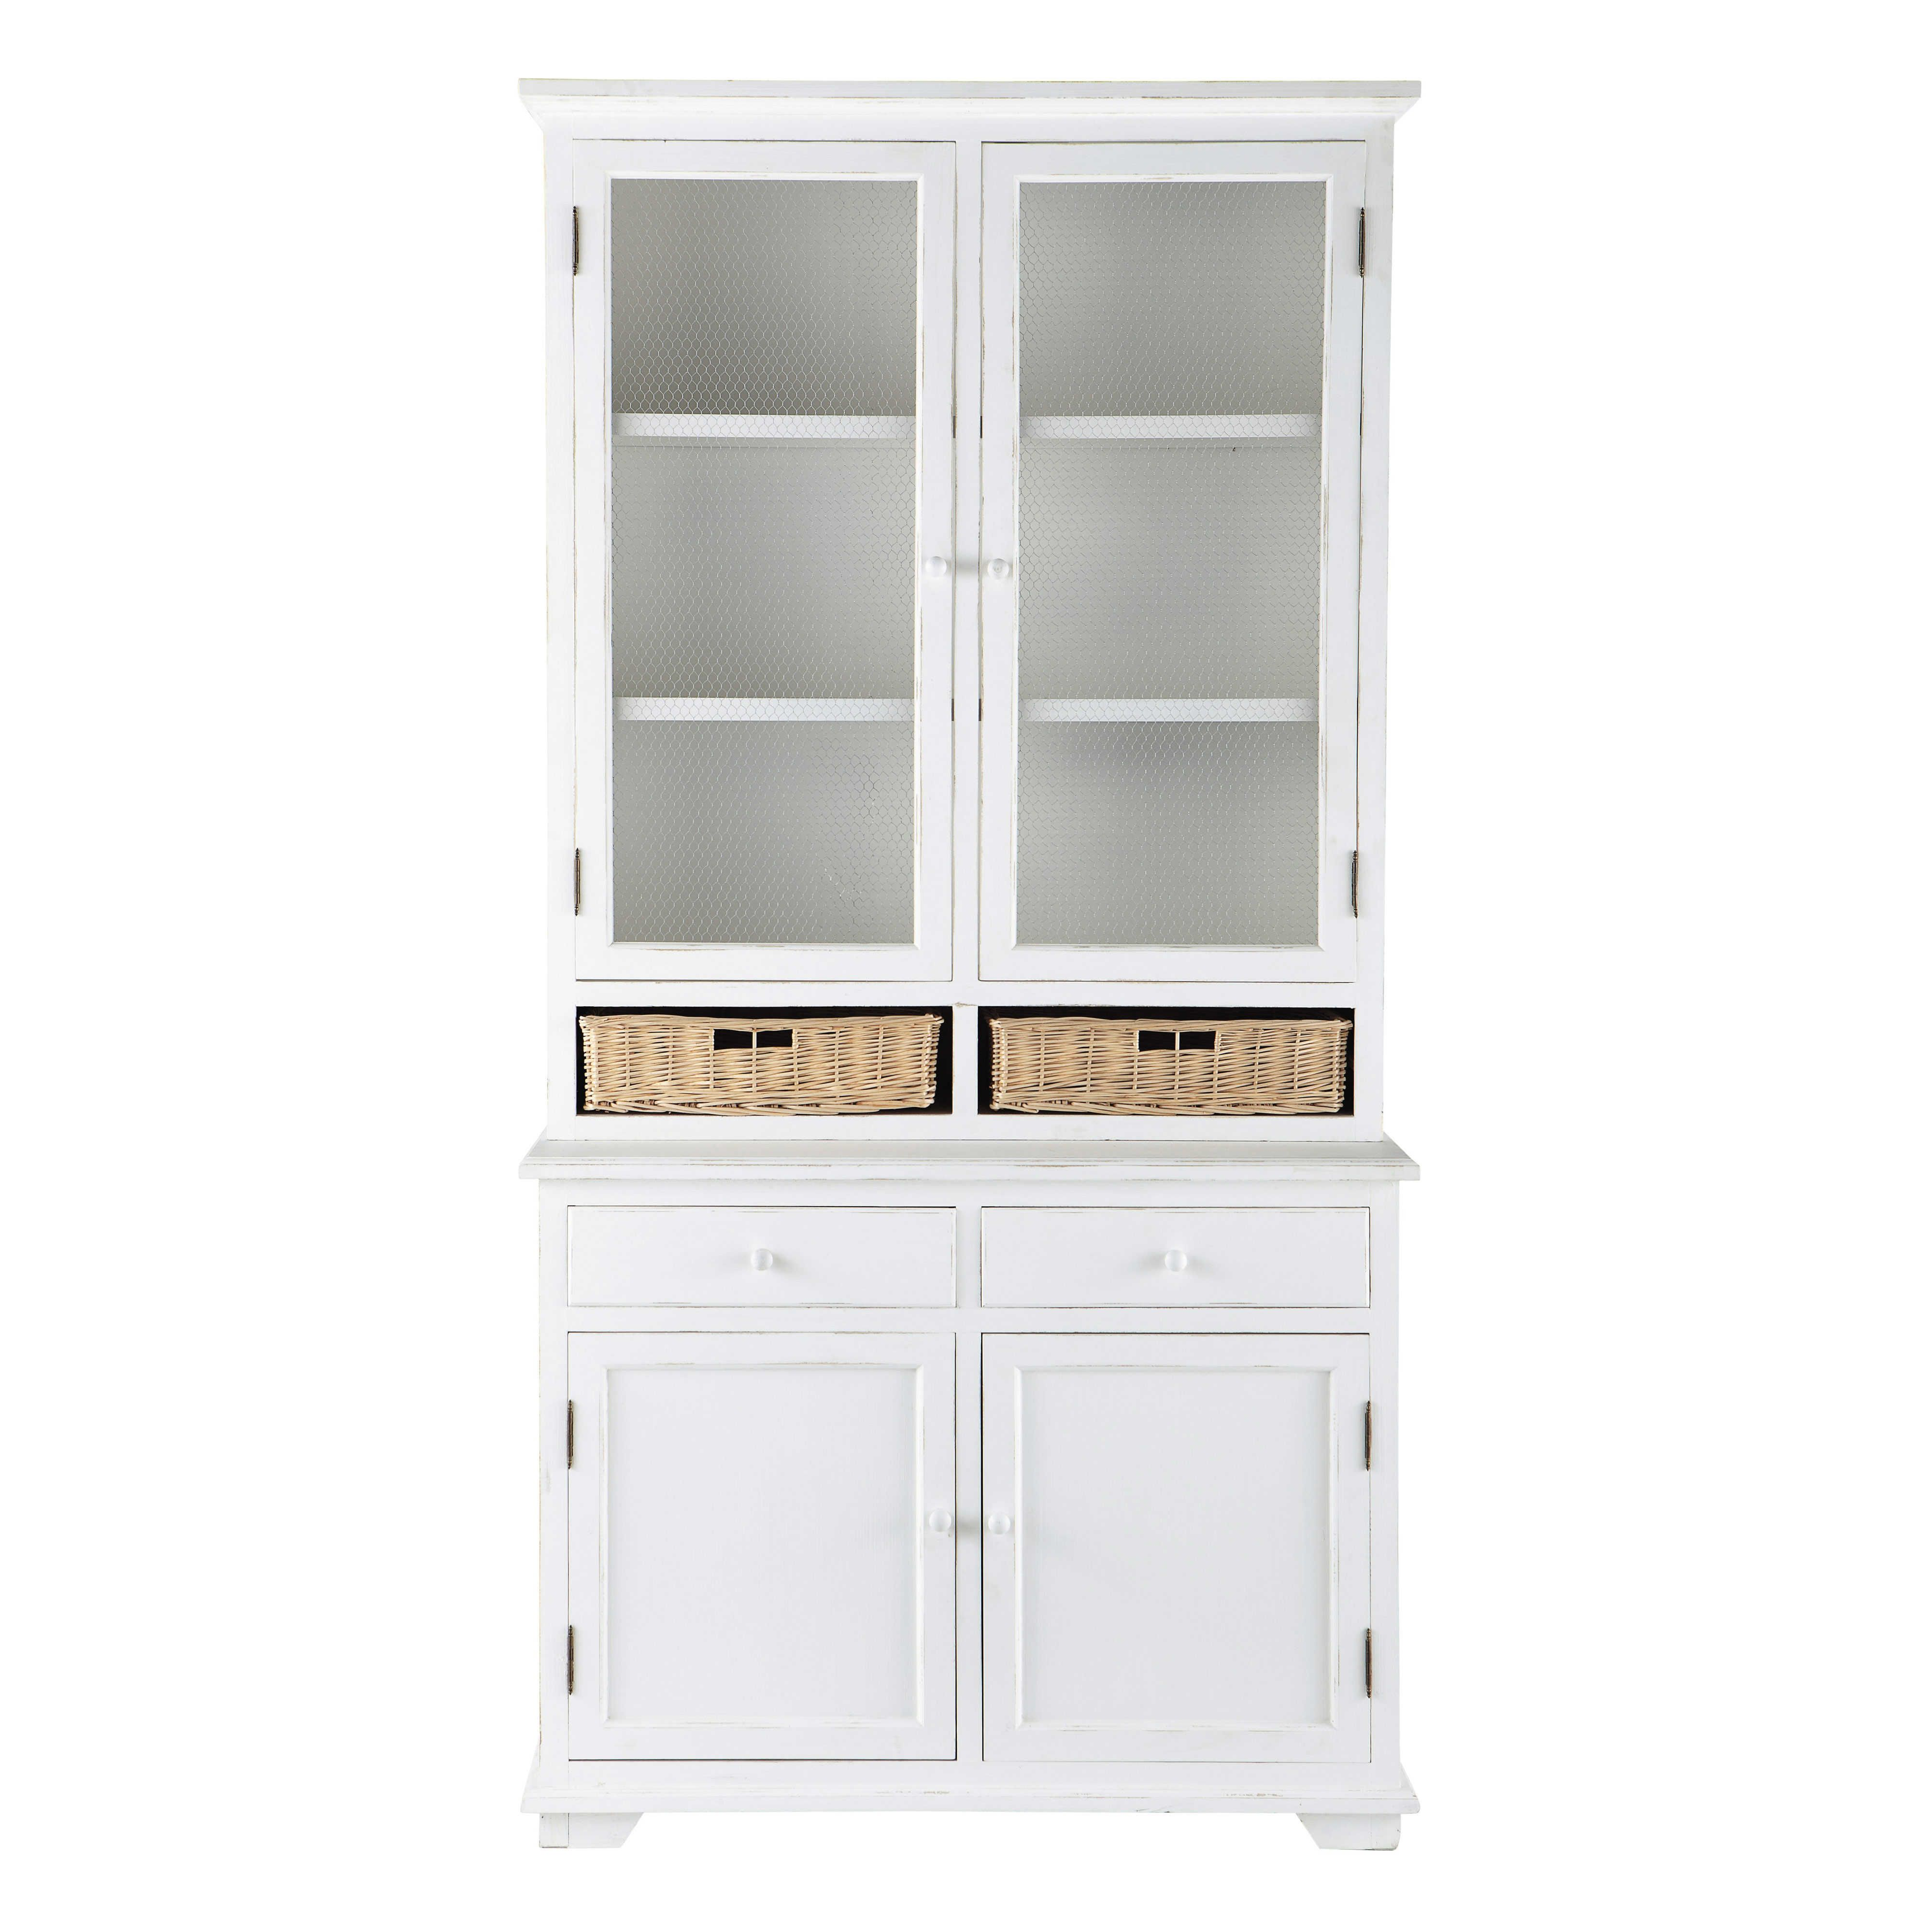 geschirrschrank ikea swalif. Black Bedroom Furniture Sets. Home Design Ideas